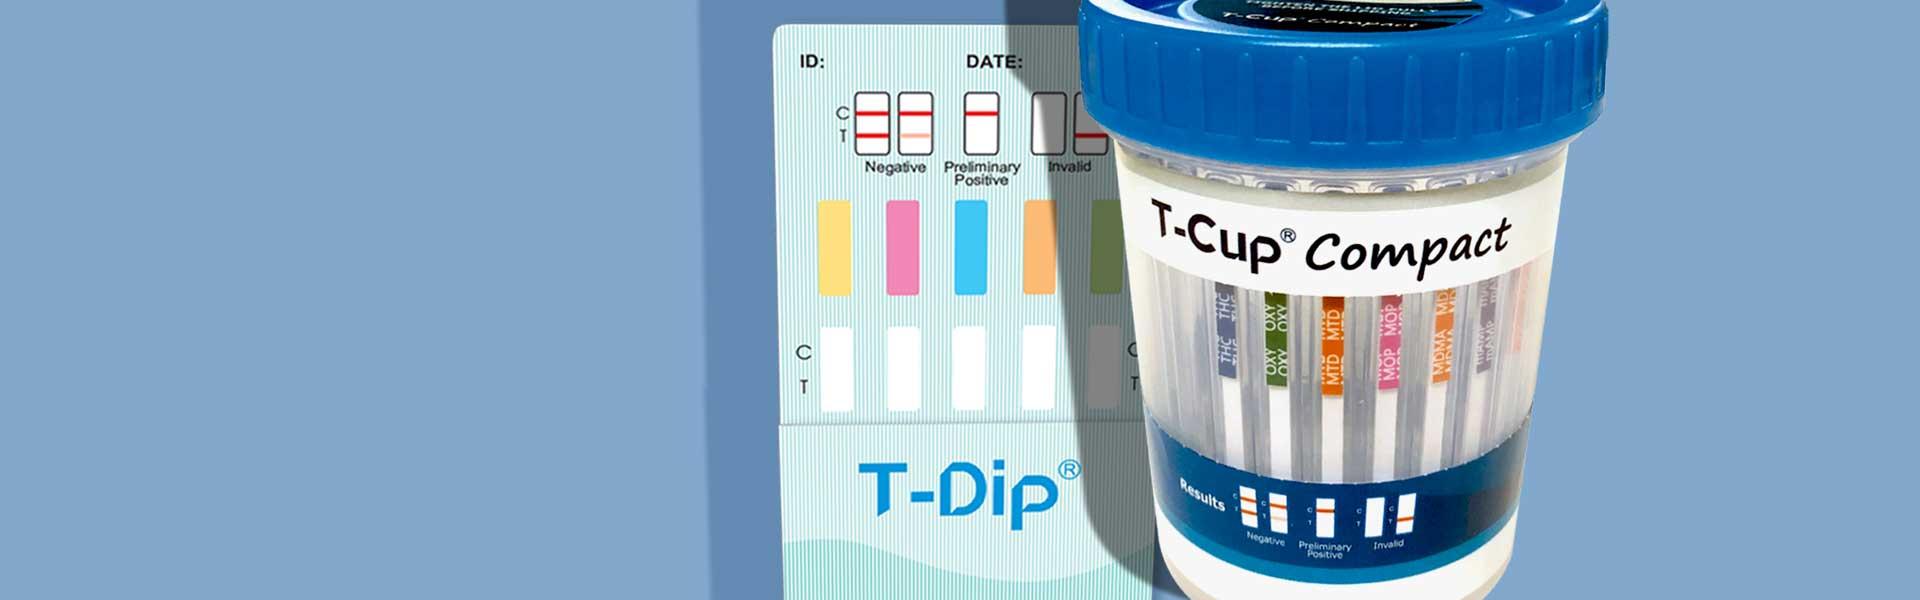 Rapid Dip Card Drug Test Kits